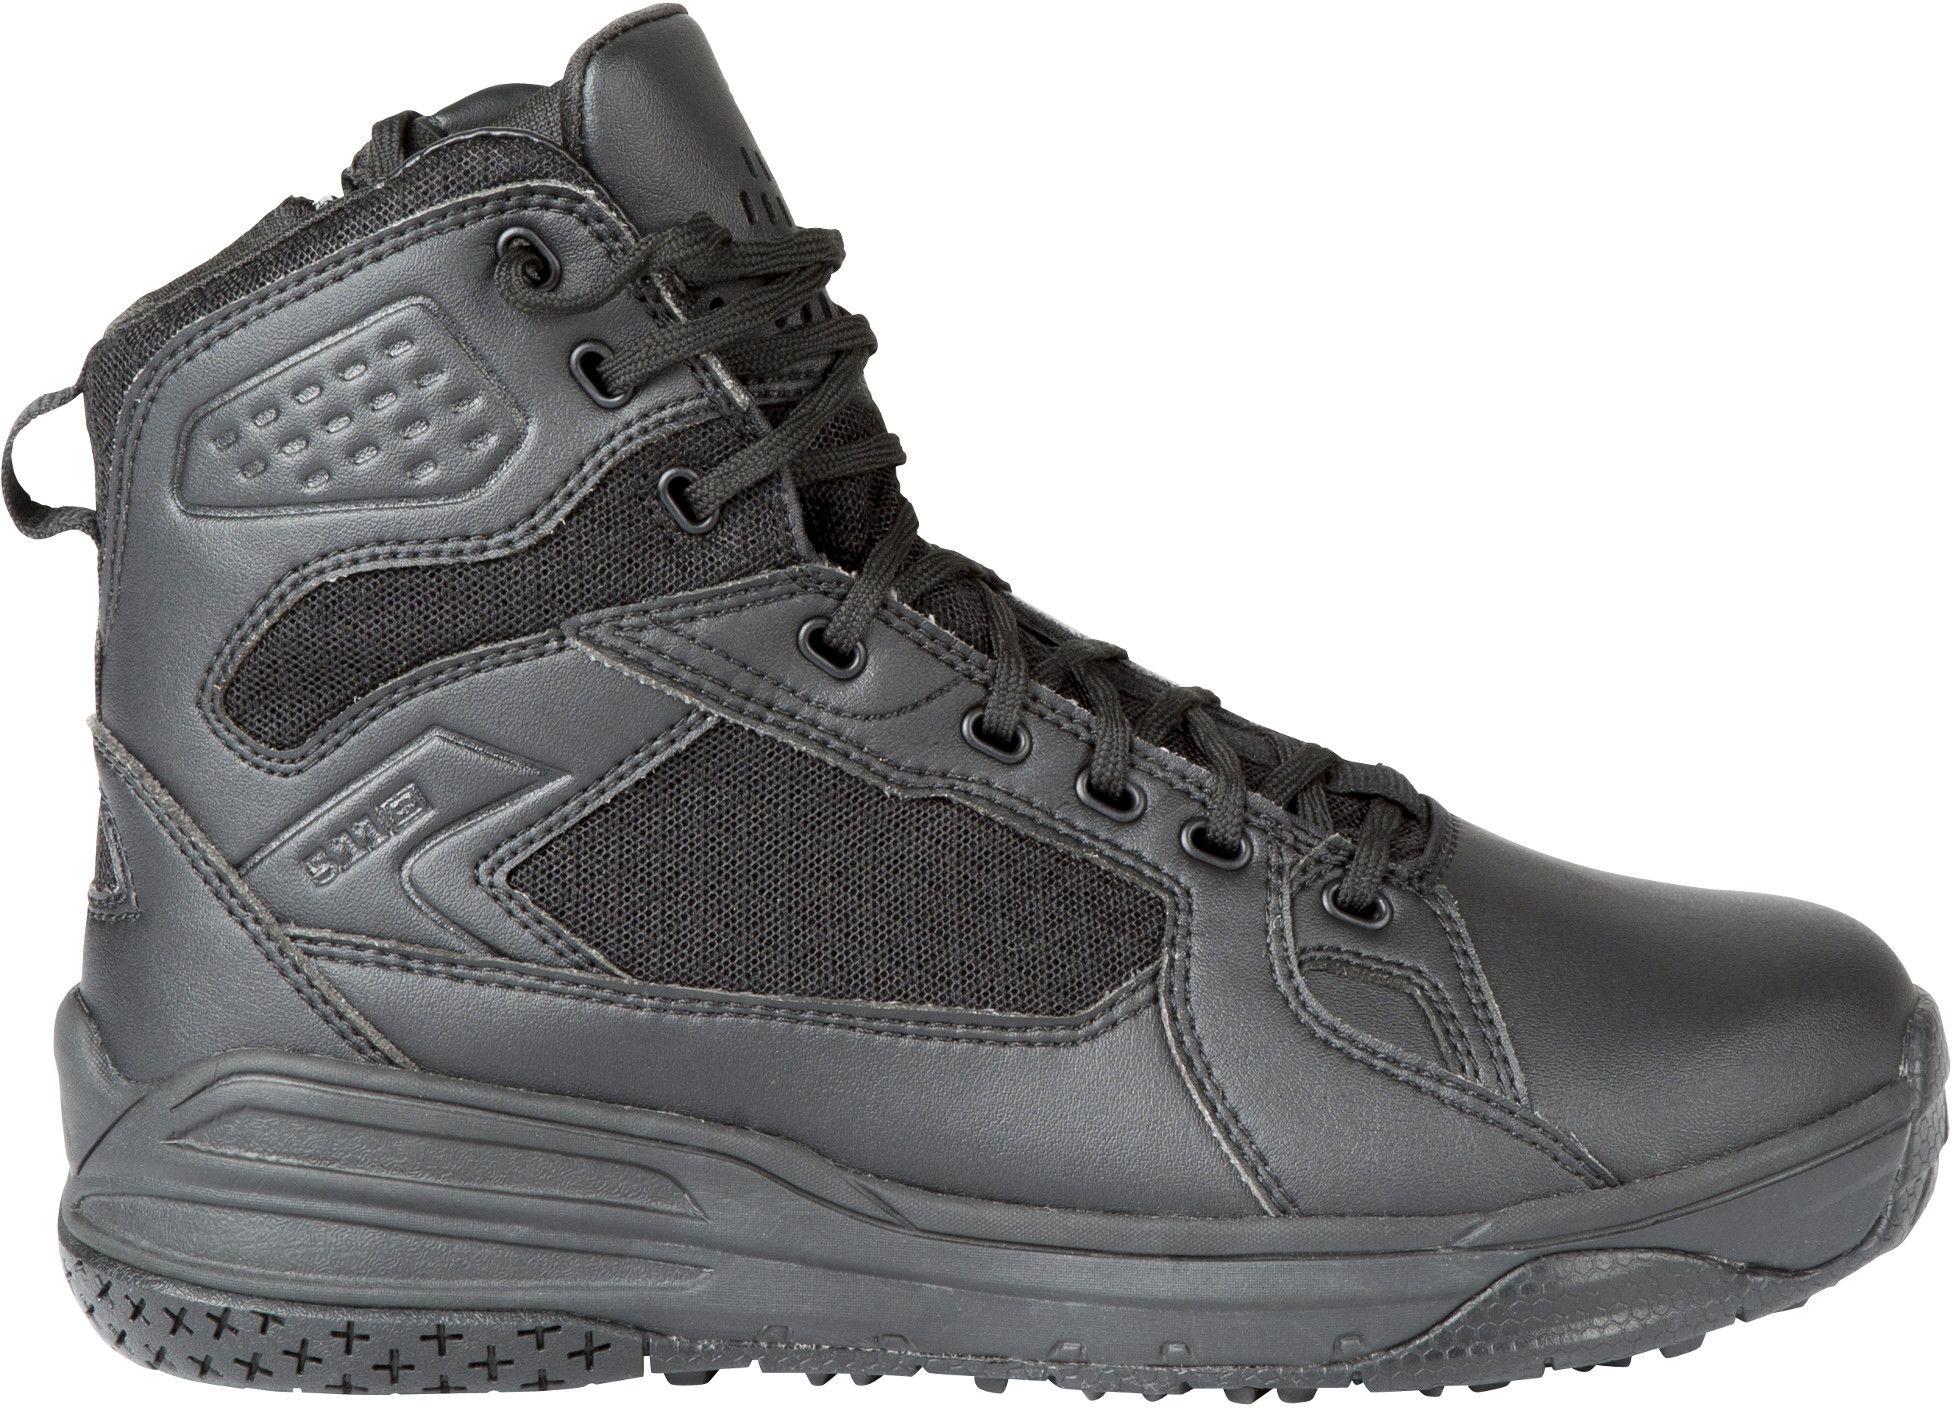 5.11 TacticalHalcyon Patrol Boots